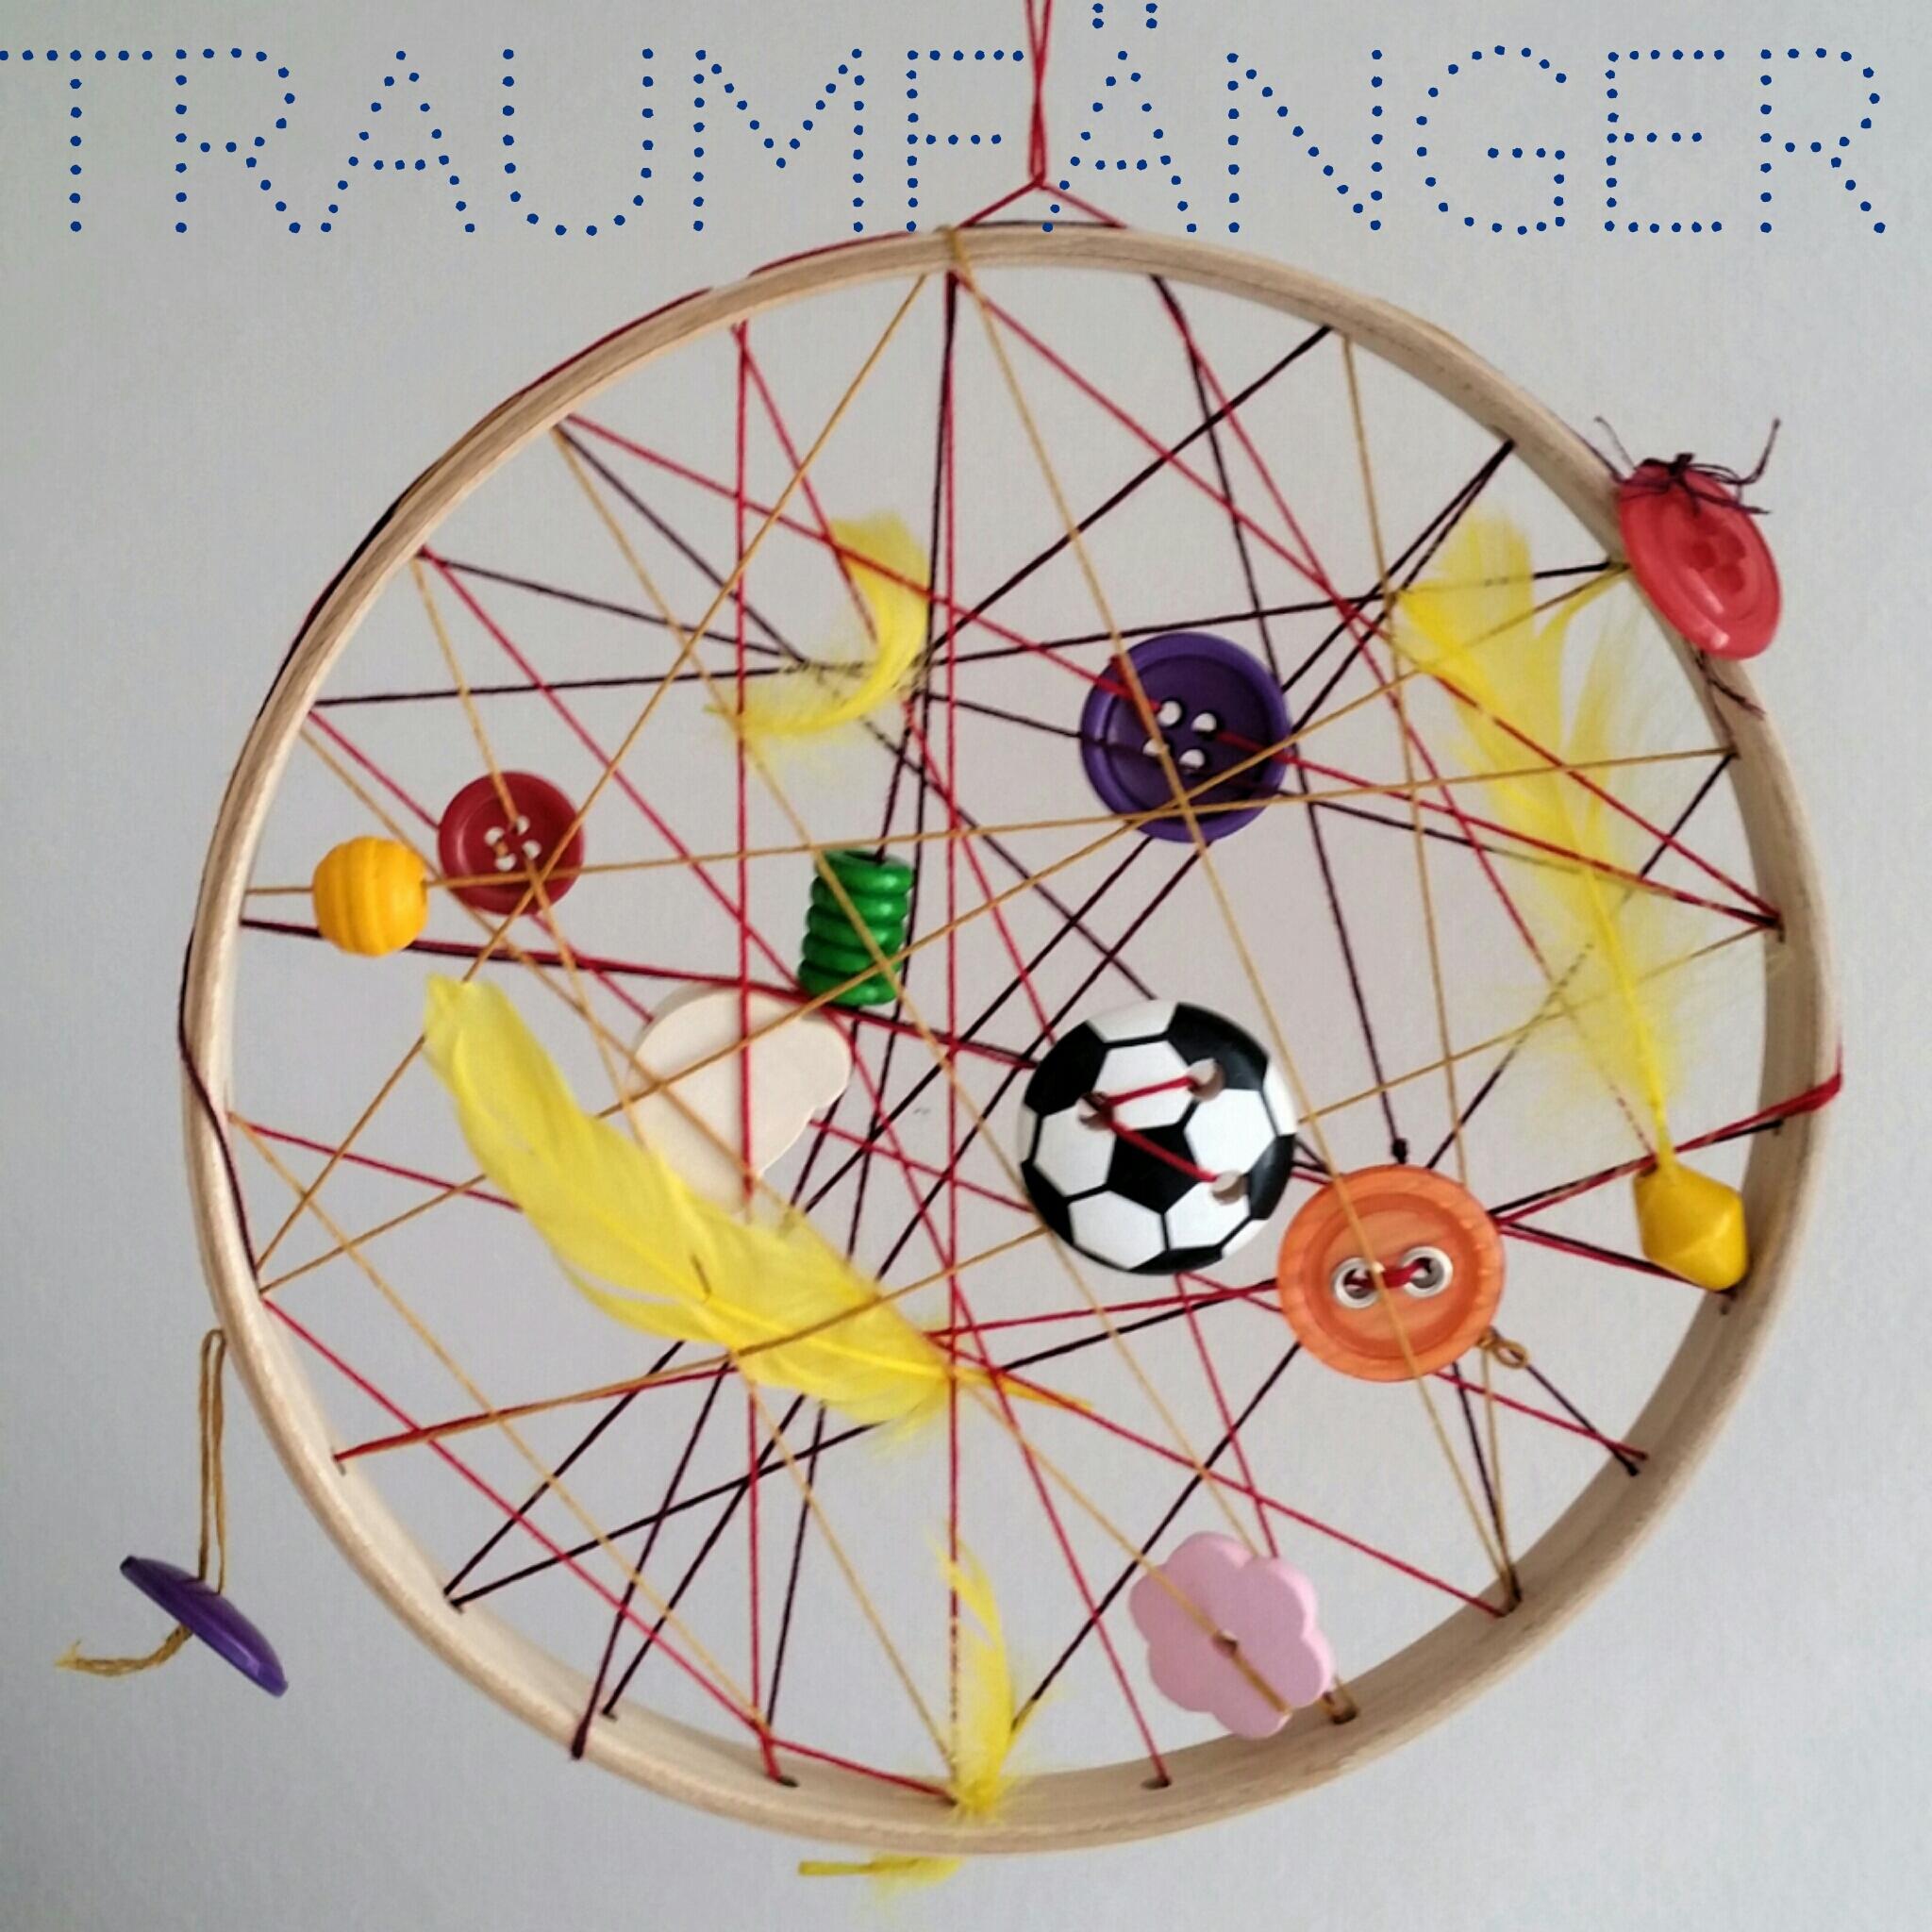 Traumfänger Dreamcatcher